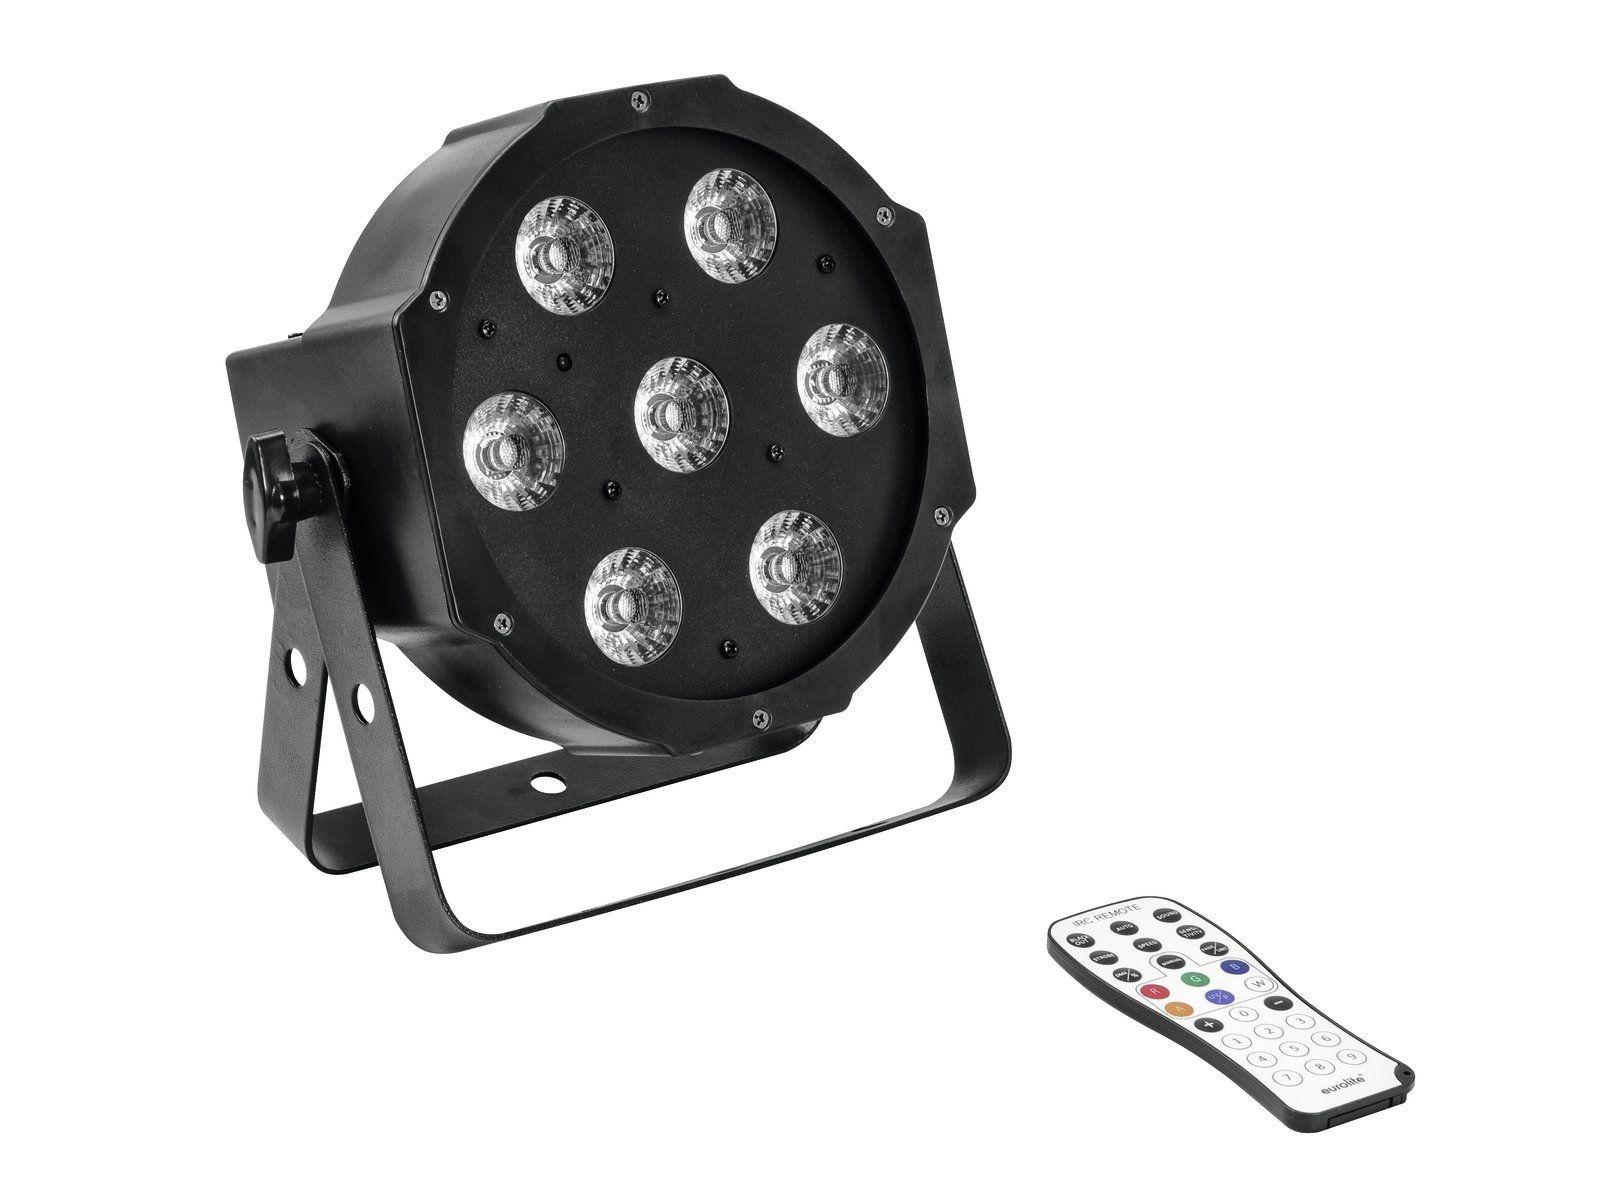 EUROLITE LED SLS-7 HCL Floor flacher LED PAR-Scheinwerfer  mit 7 x 10 W RGBW+UV